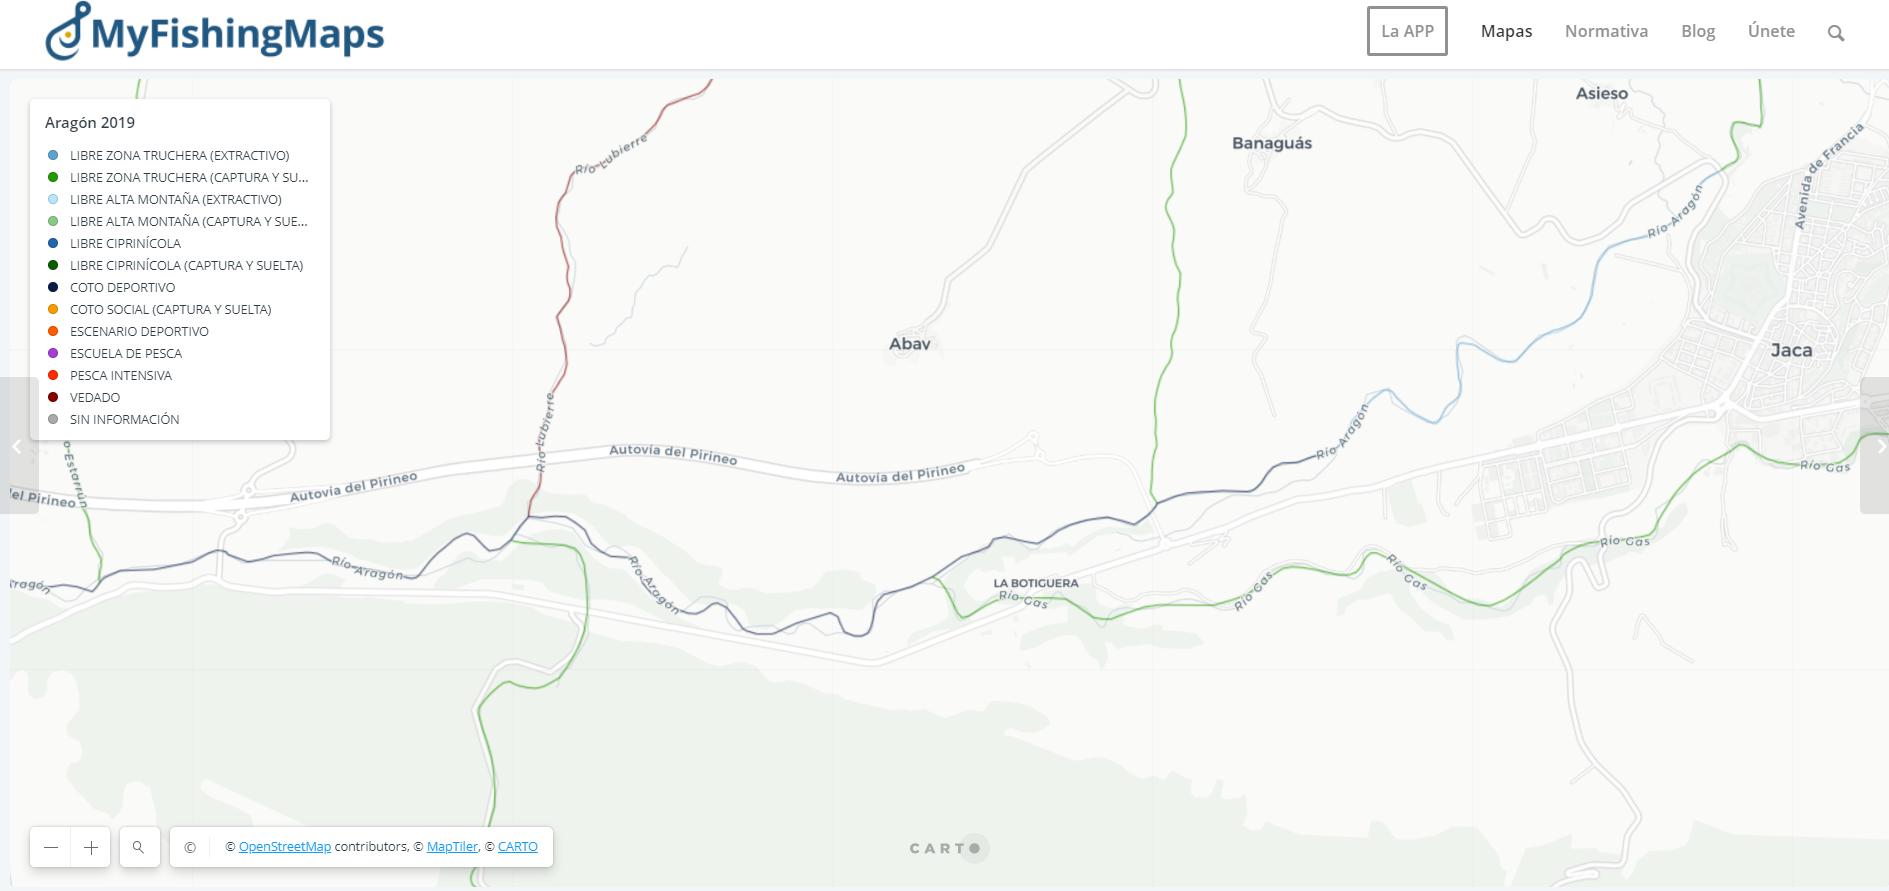 Carte du rio Aragon